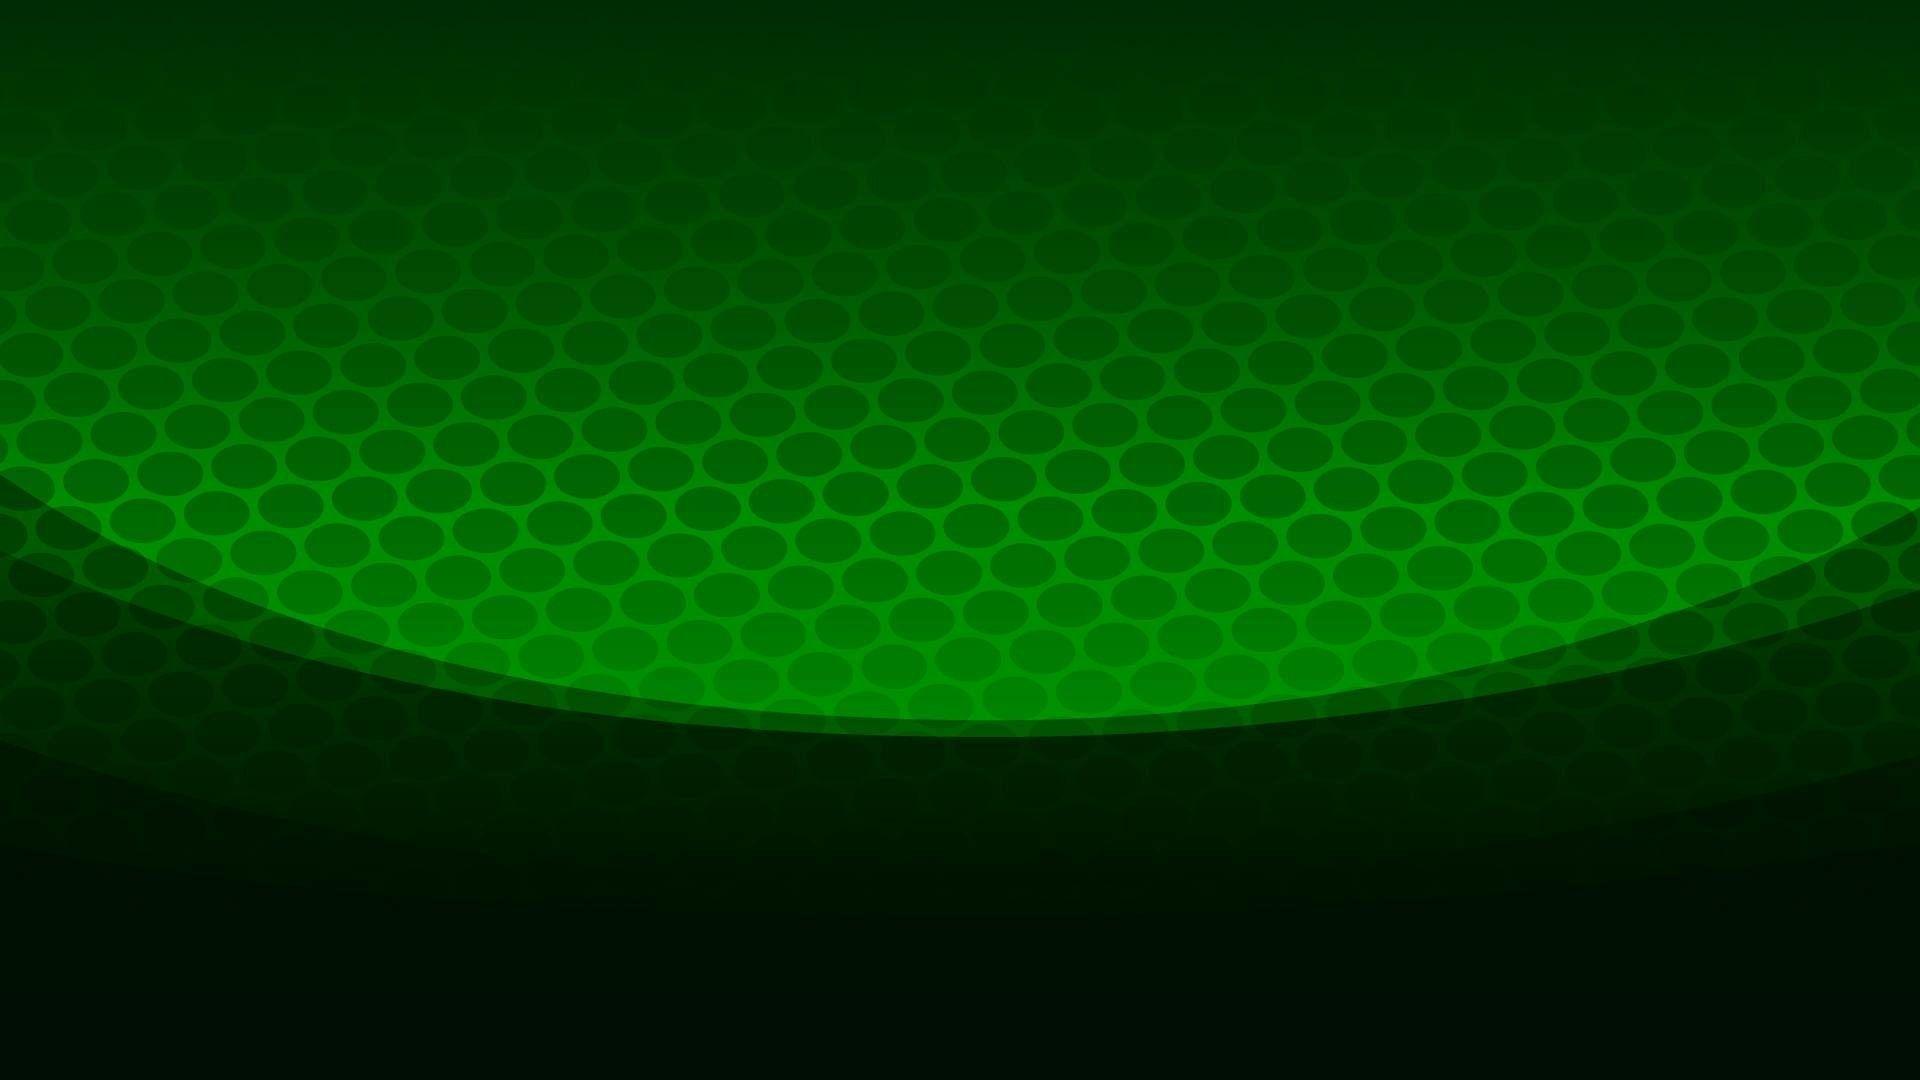 Neon Green Pc Wallpaper Hd - Dark Green Abstract Background - HD Wallpaper